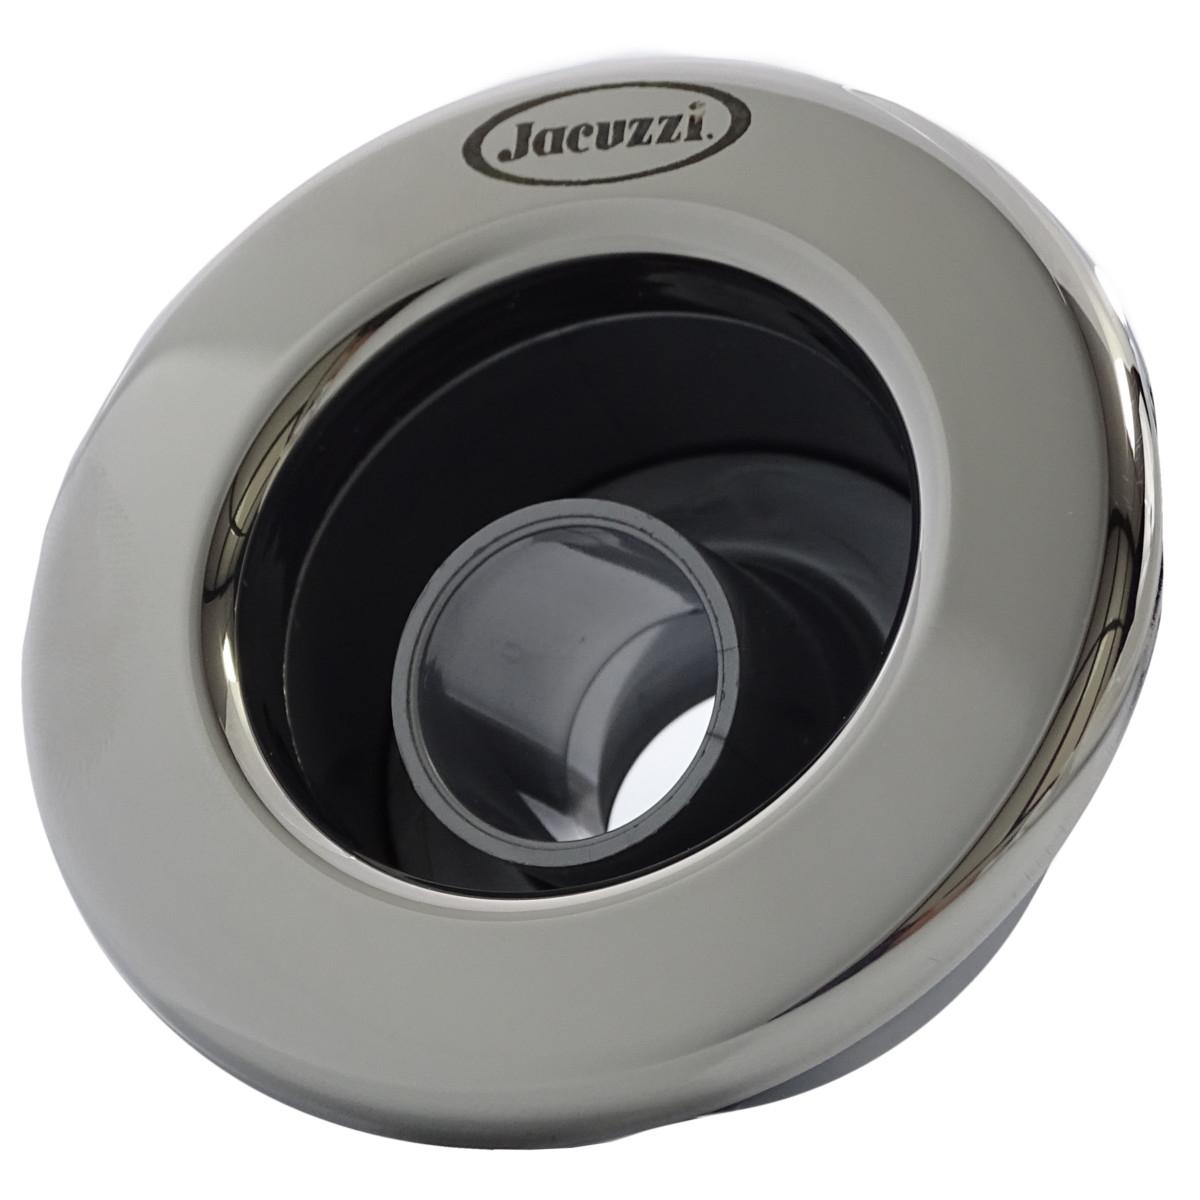 Dispositivo De Retorno Para Piscina Jacuzzi Dr50-18 Inox